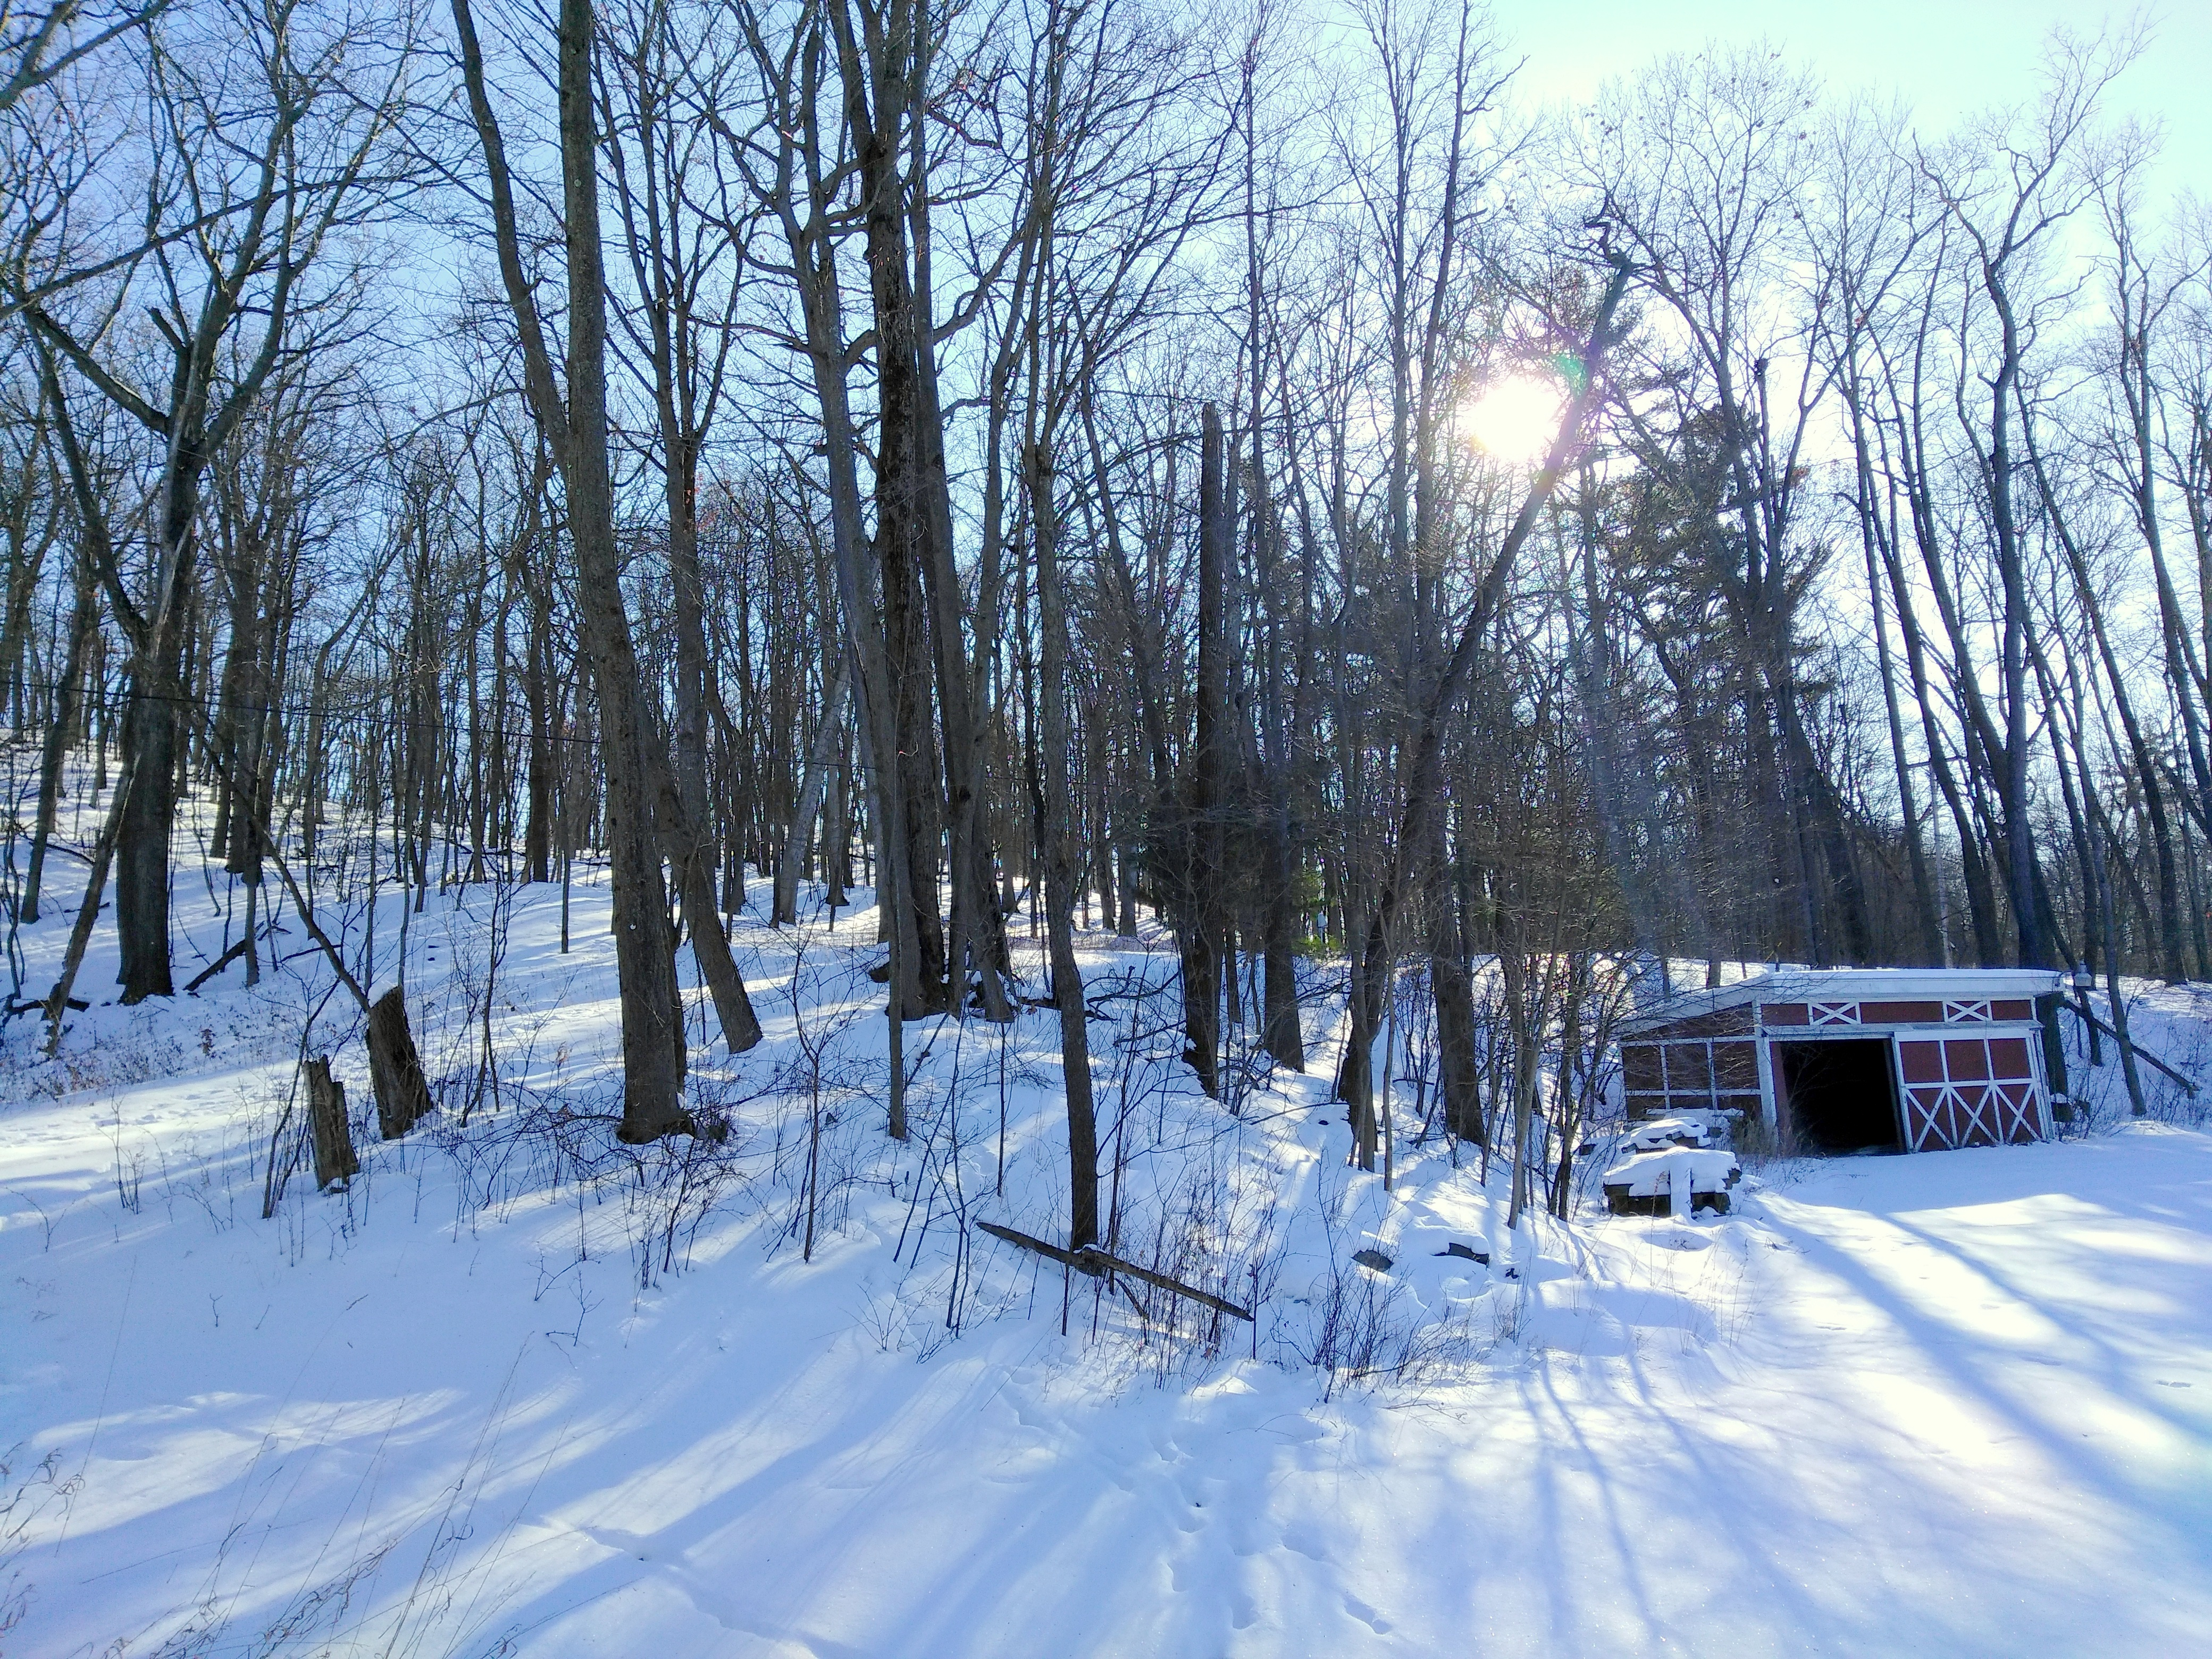 caretaker's shed at lost lake